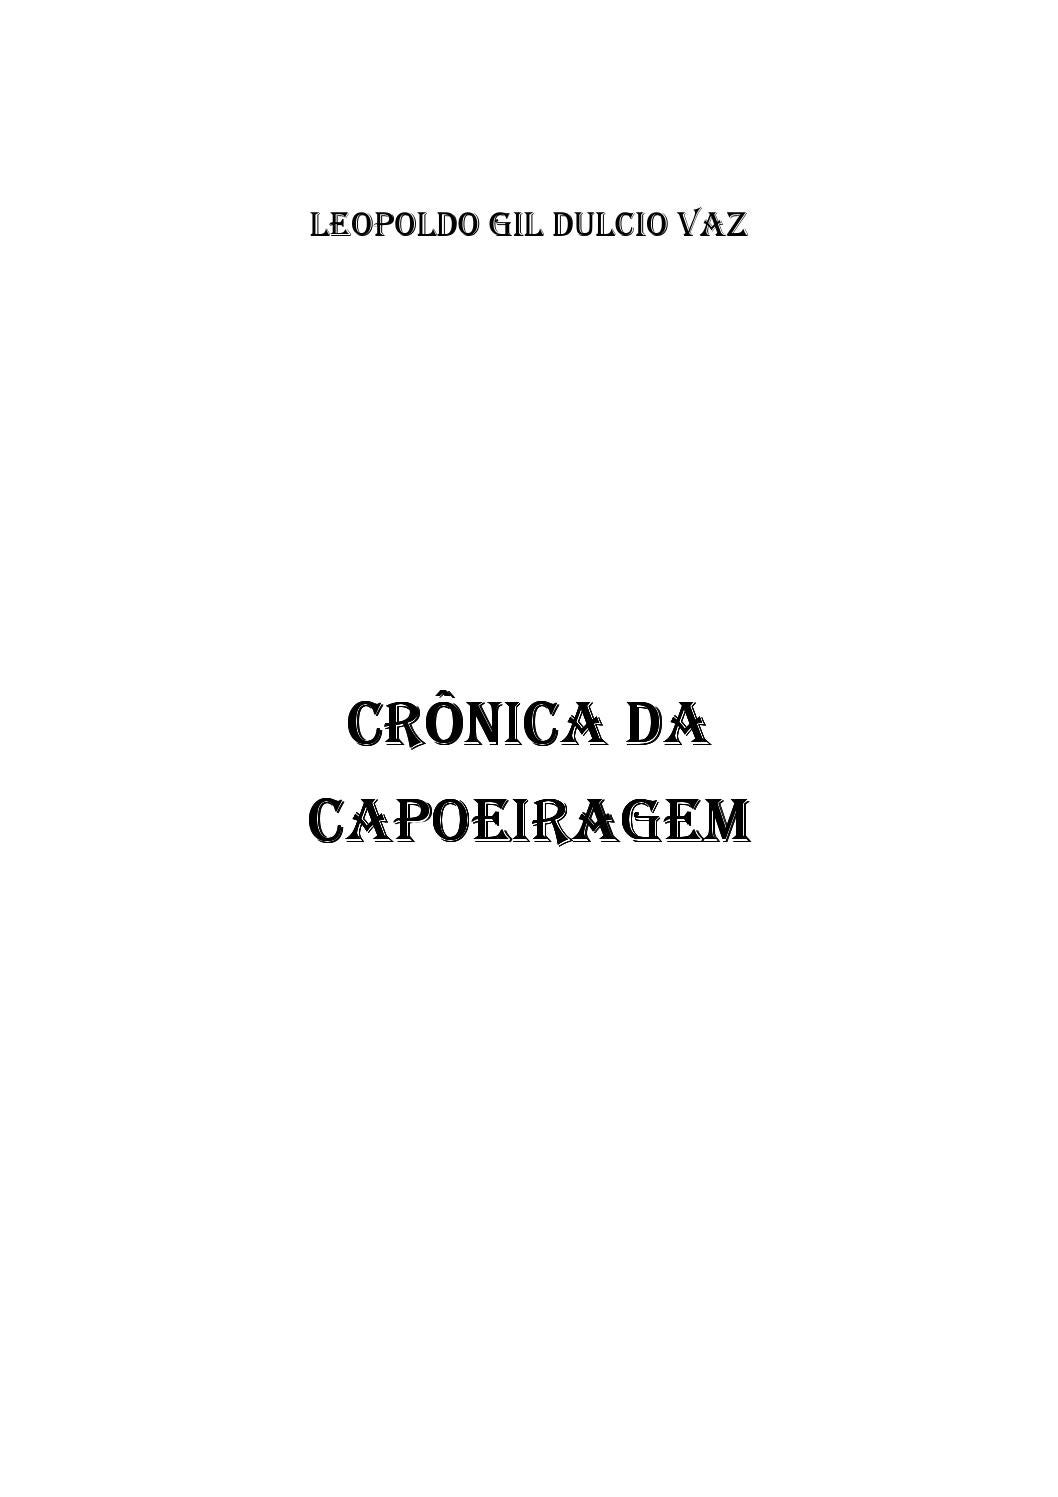 Cronica da capoeiragem issuu by Leopoldo Gil Dulcio Vaz - issuu 42e241a00ff7a